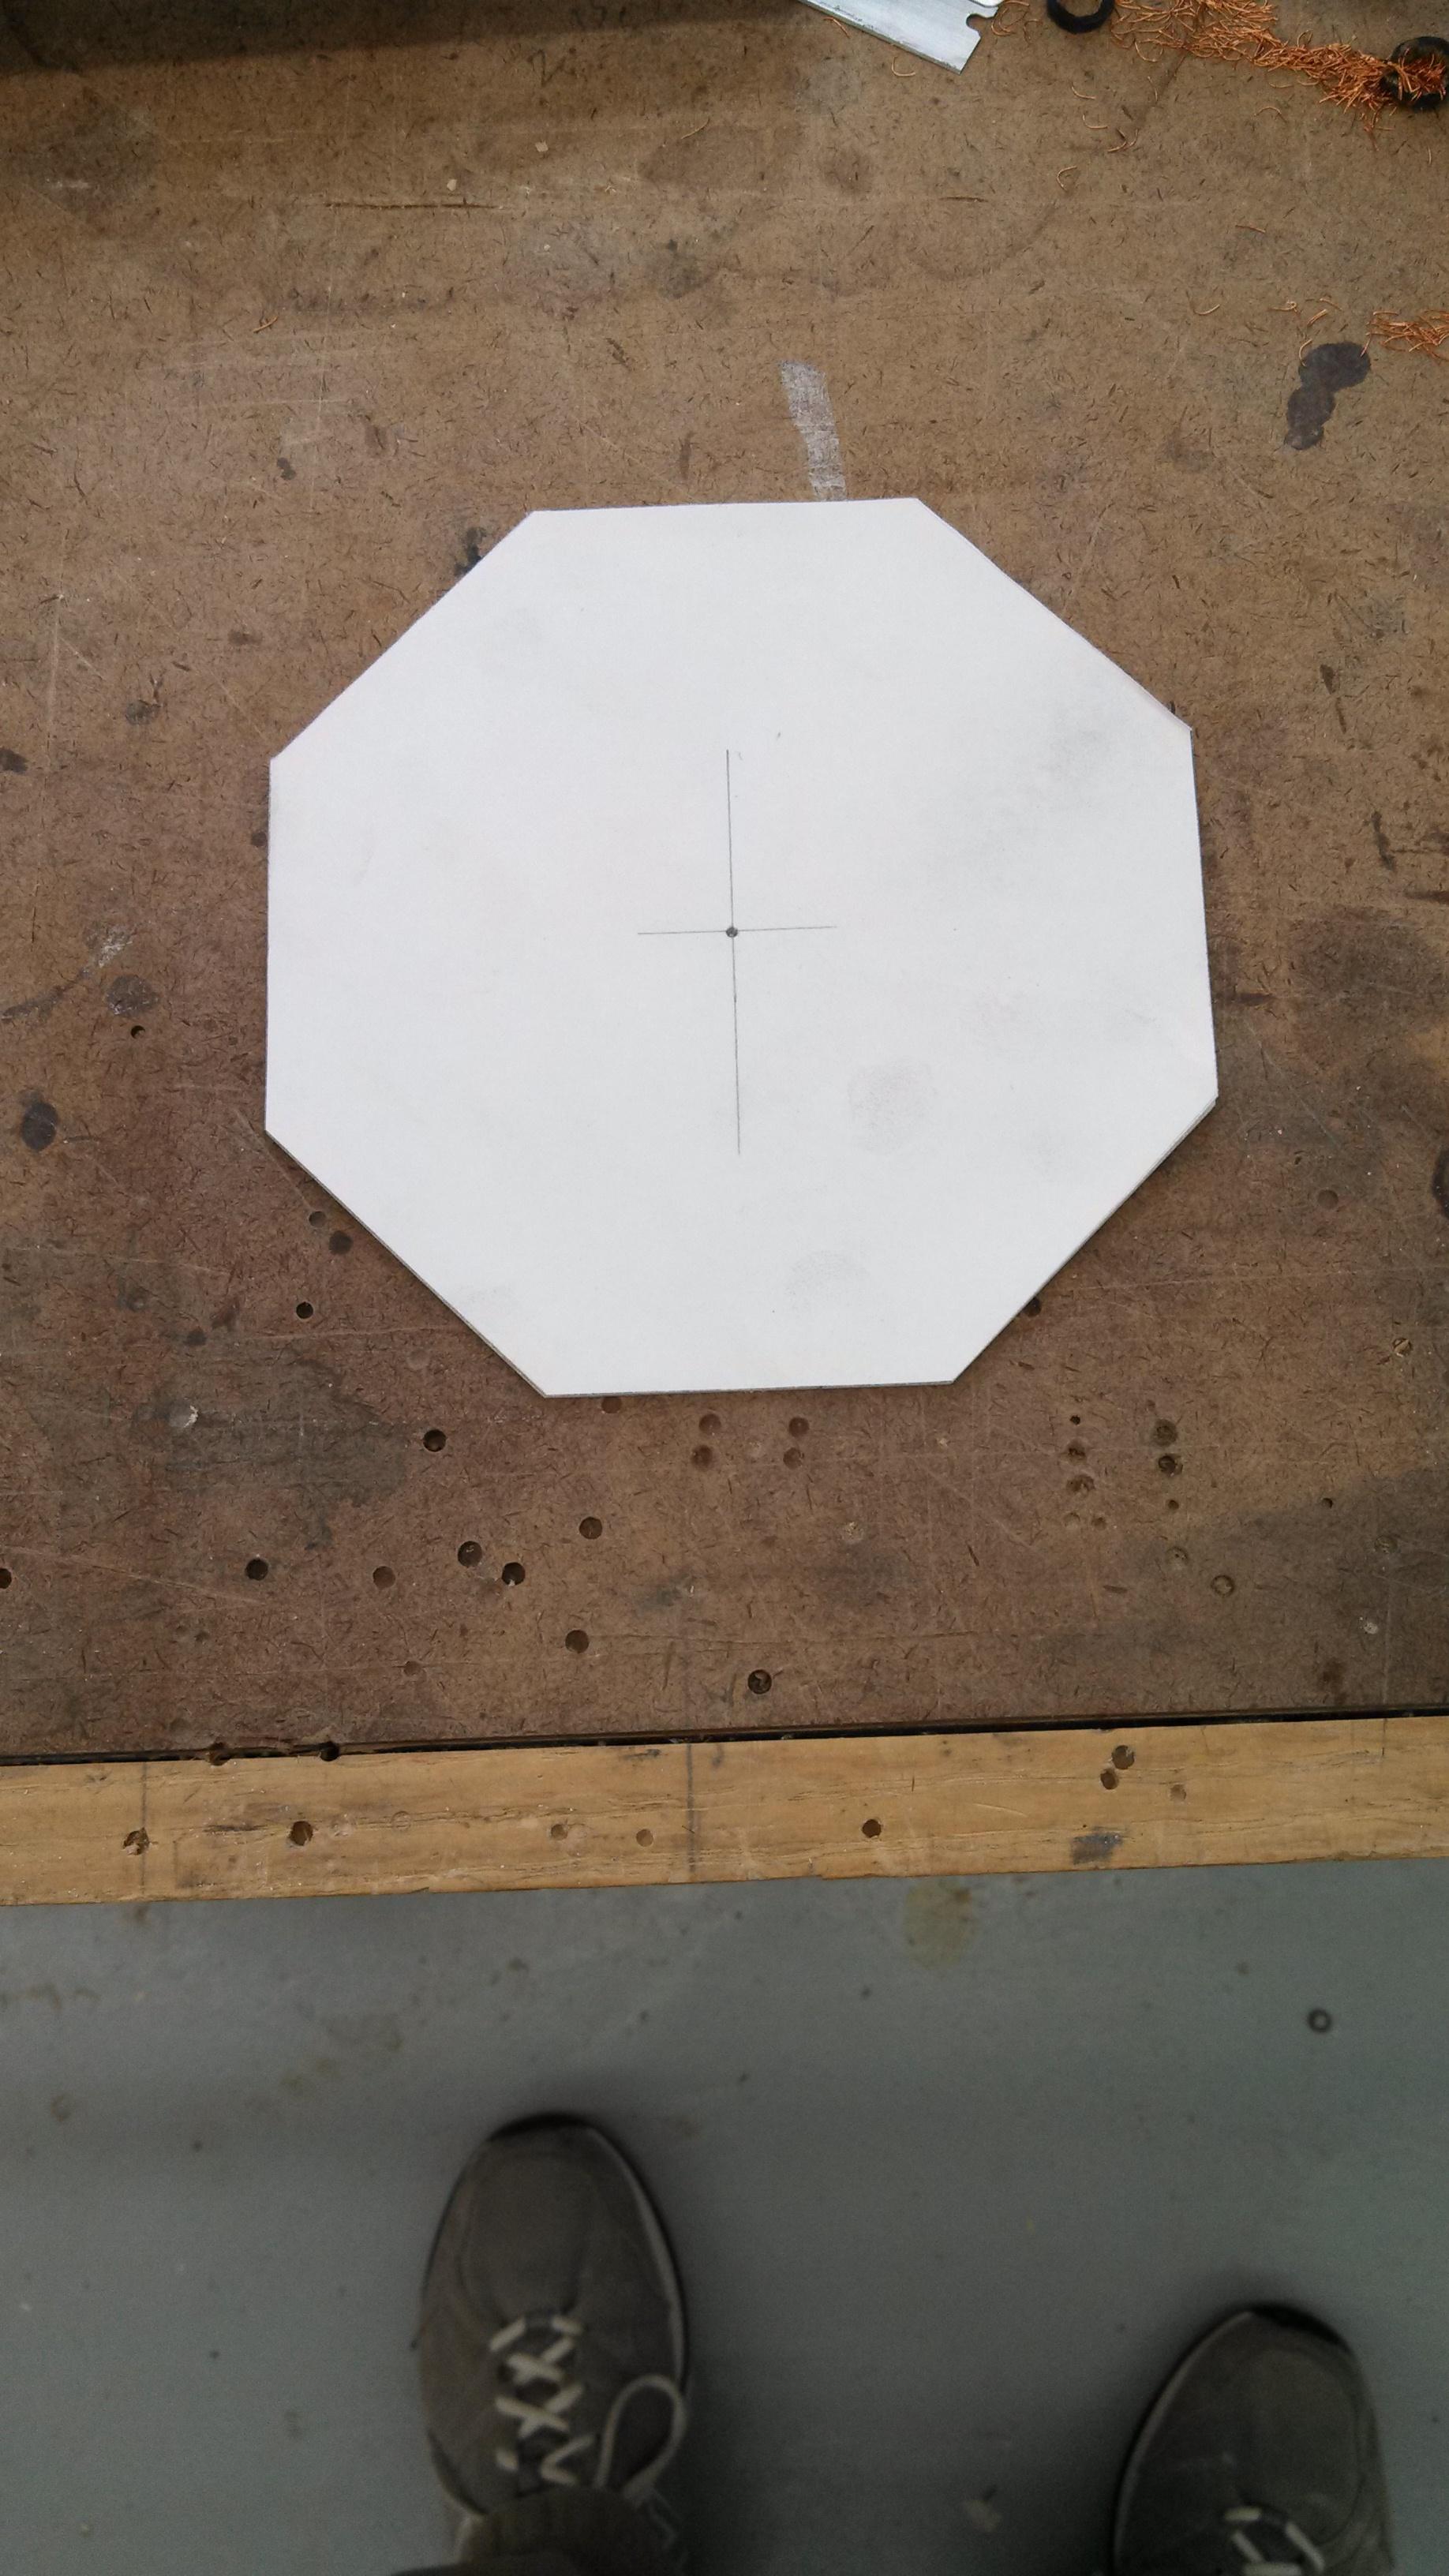 13 1 6 transponder antenna ground plane